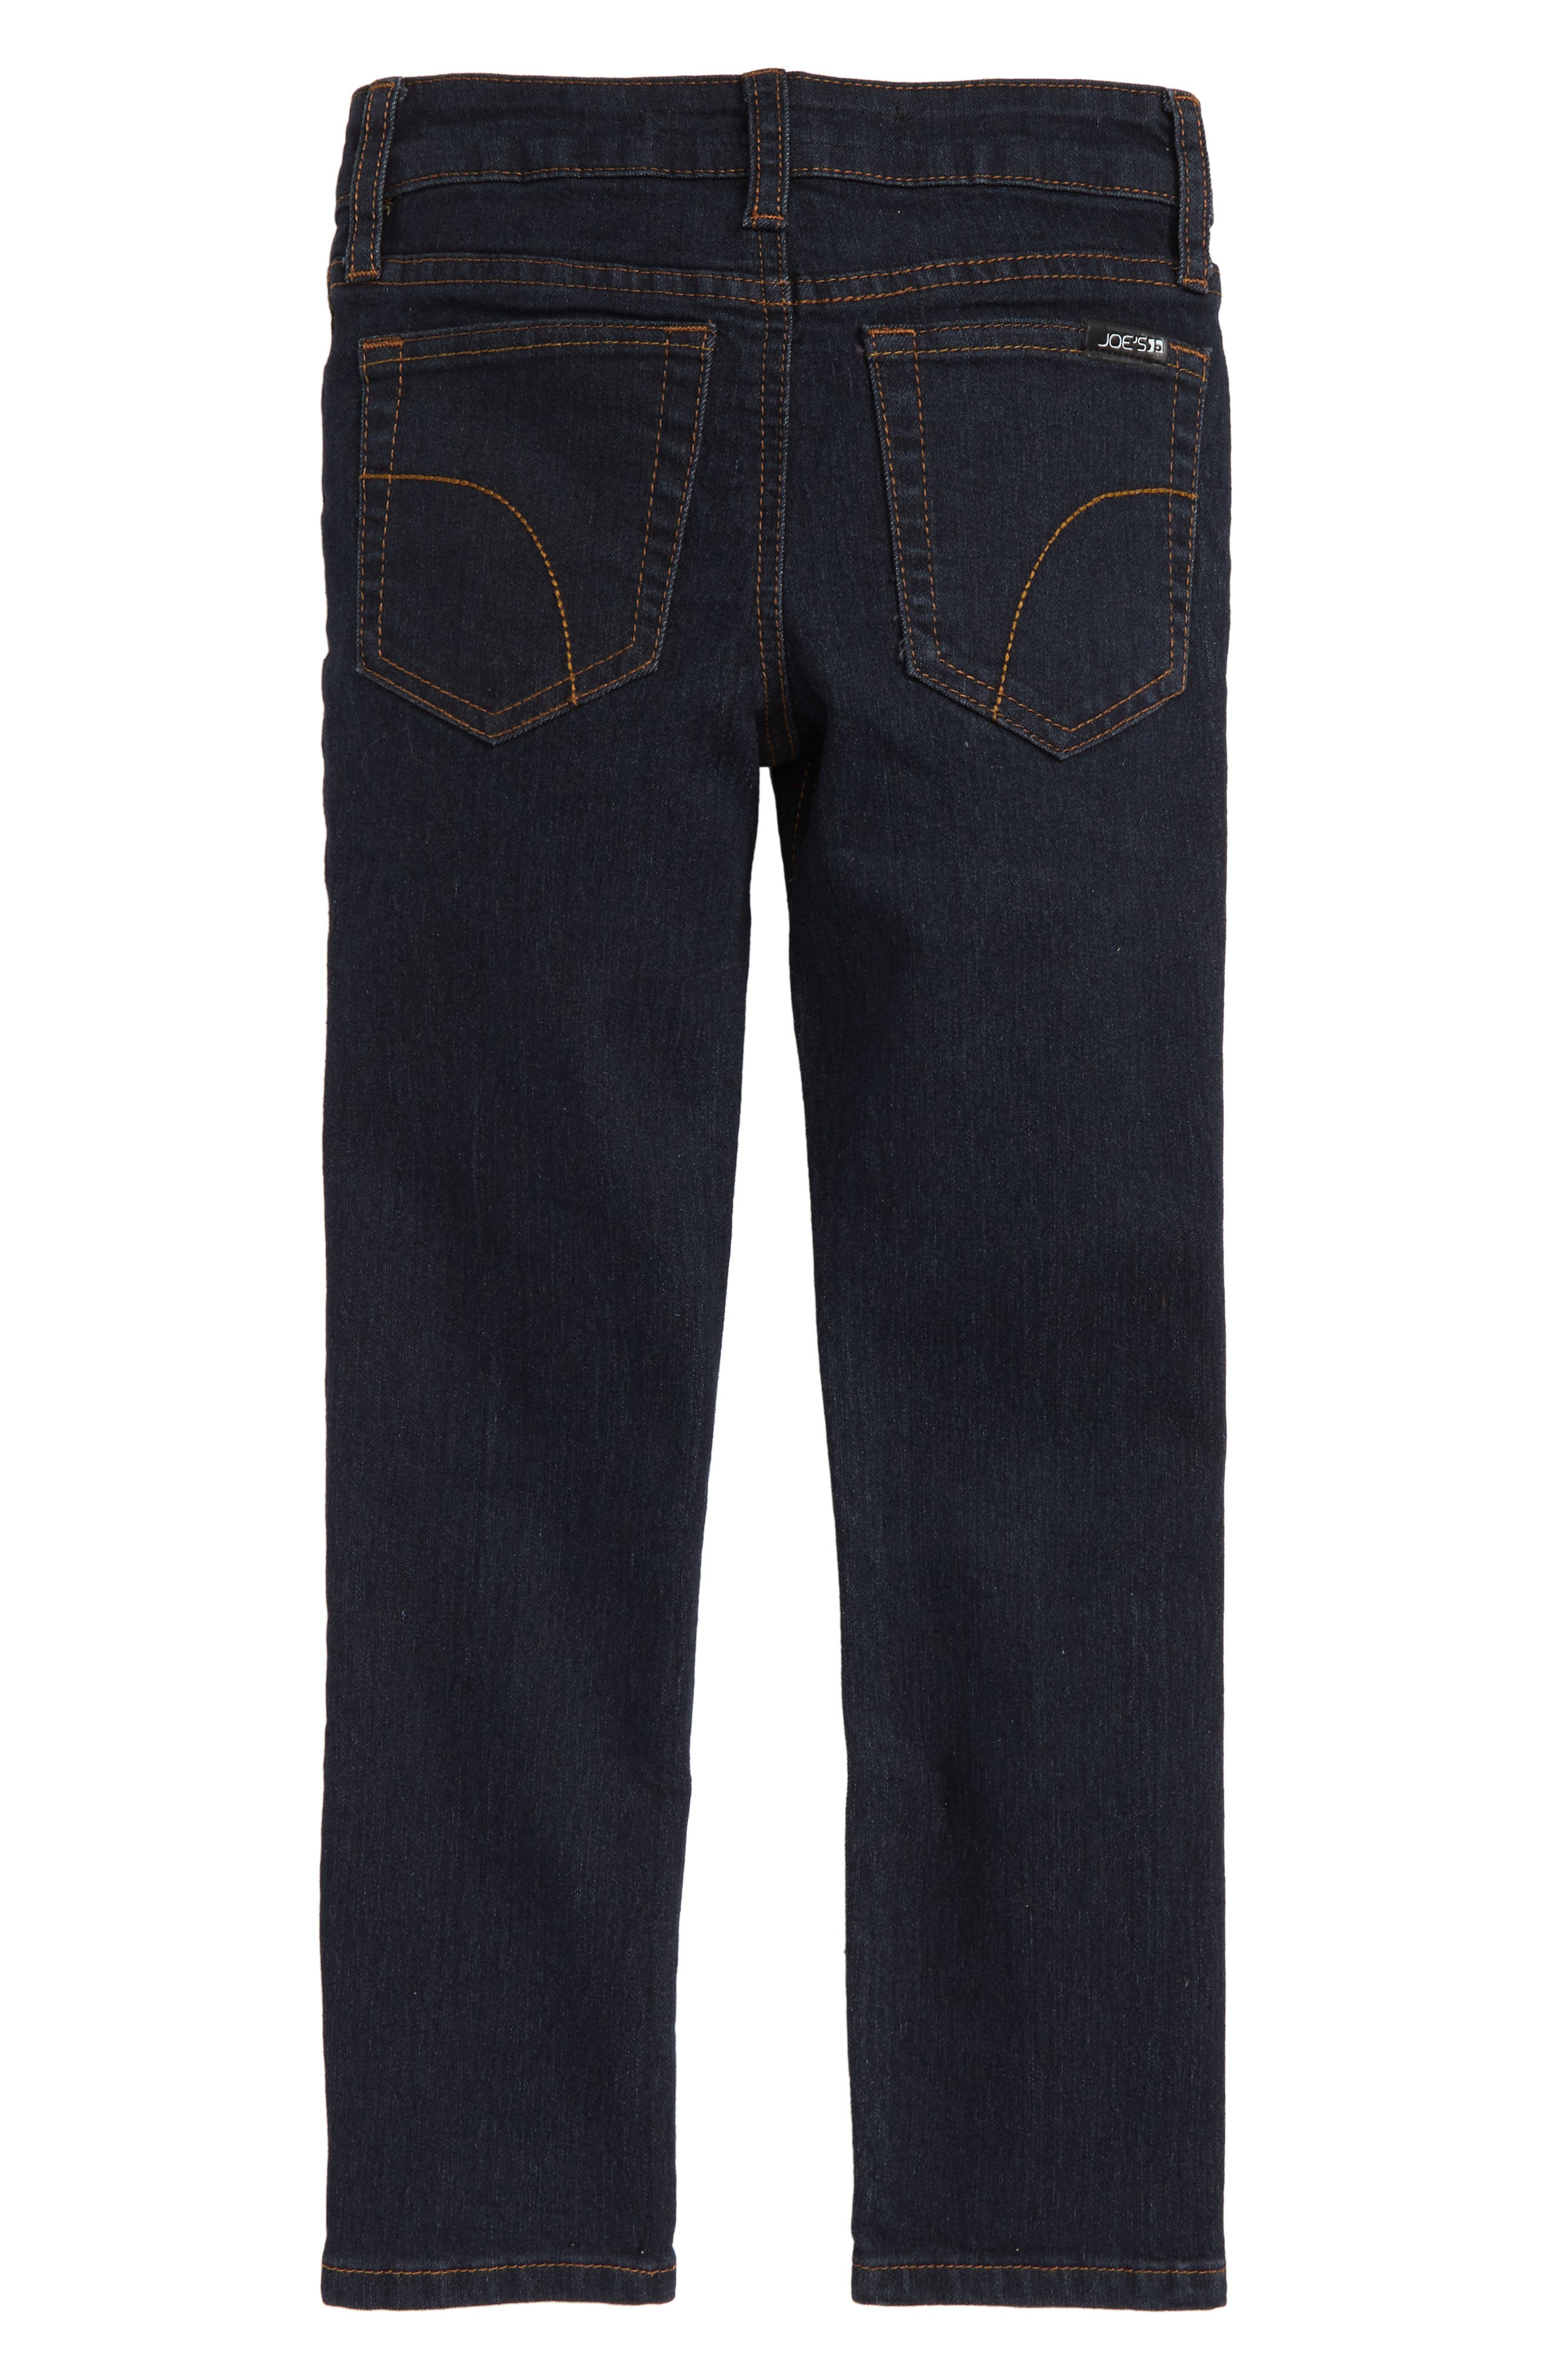 JOE'S, Brixton Stretch Jeans, Alternate thumbnail 2, color, RINSE